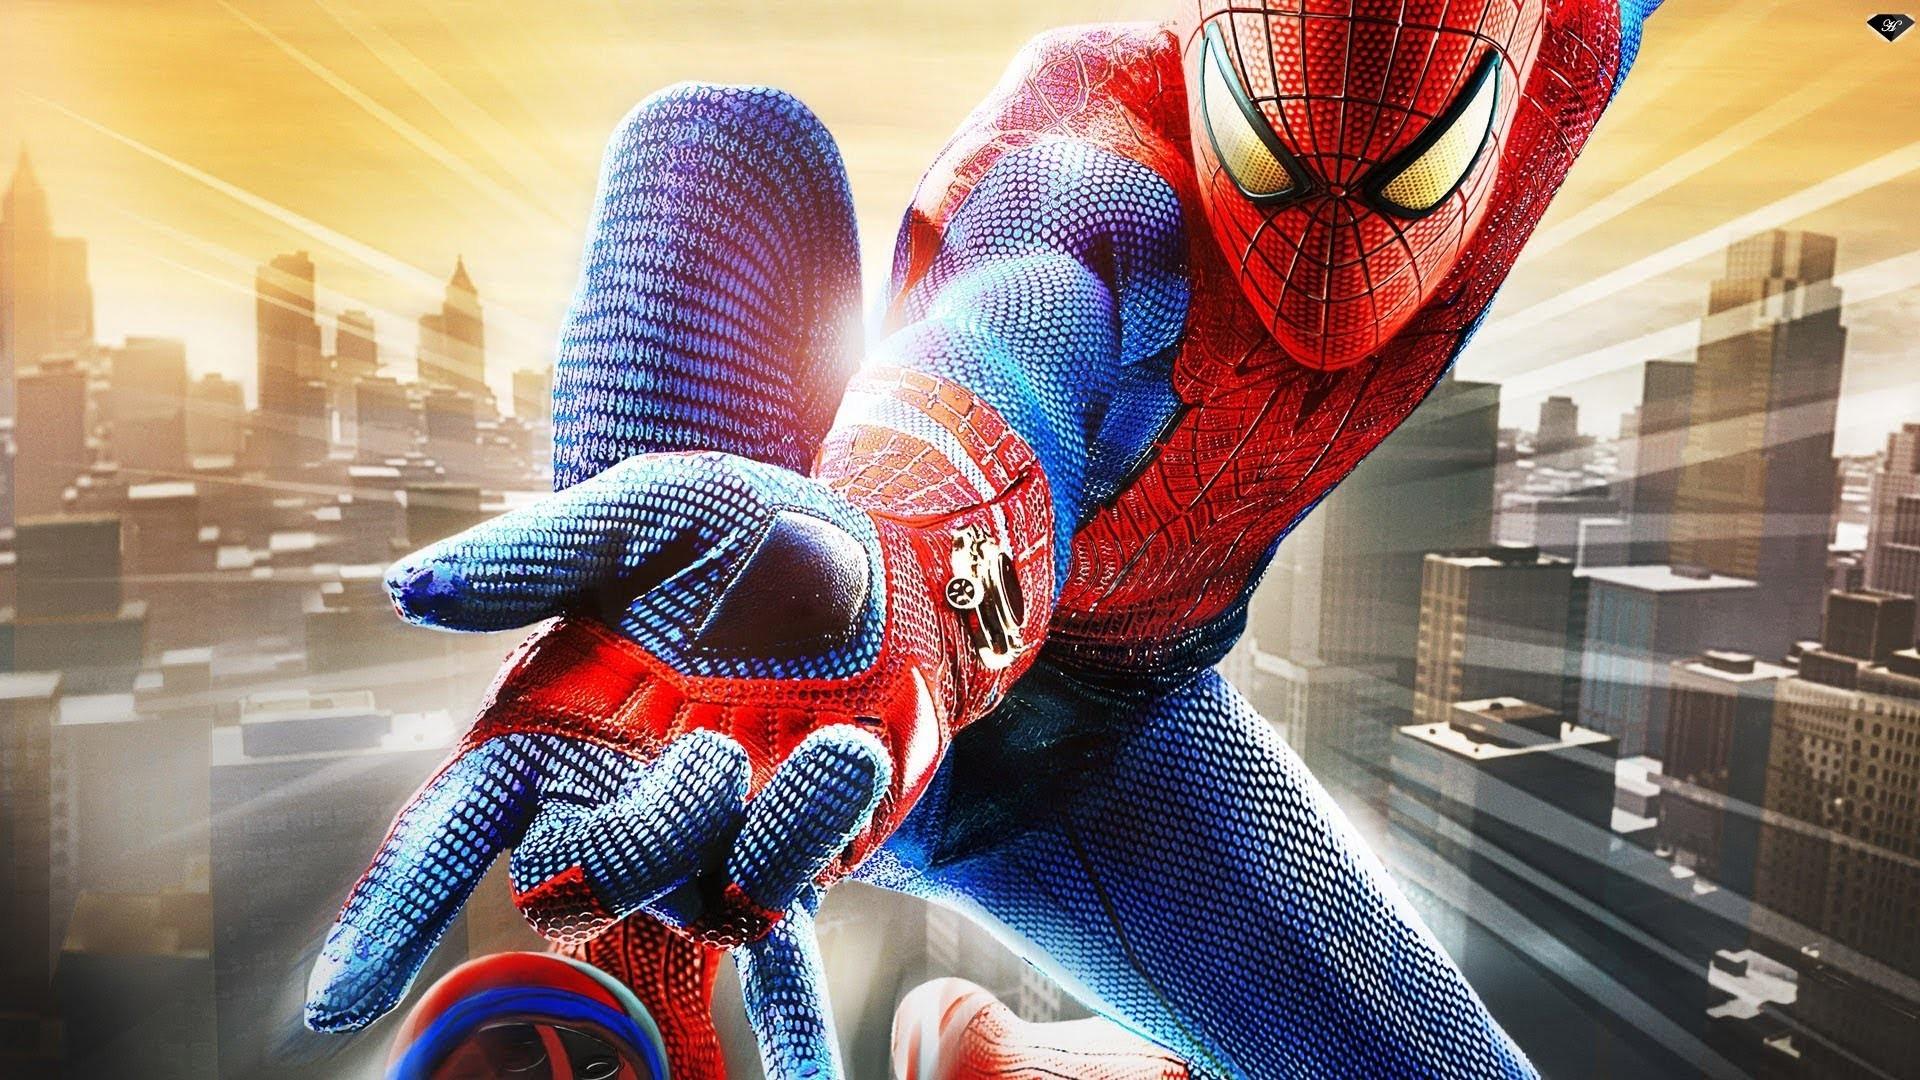 Spider man hd wallpapers 1080p 73 images - Man wallpaper ...